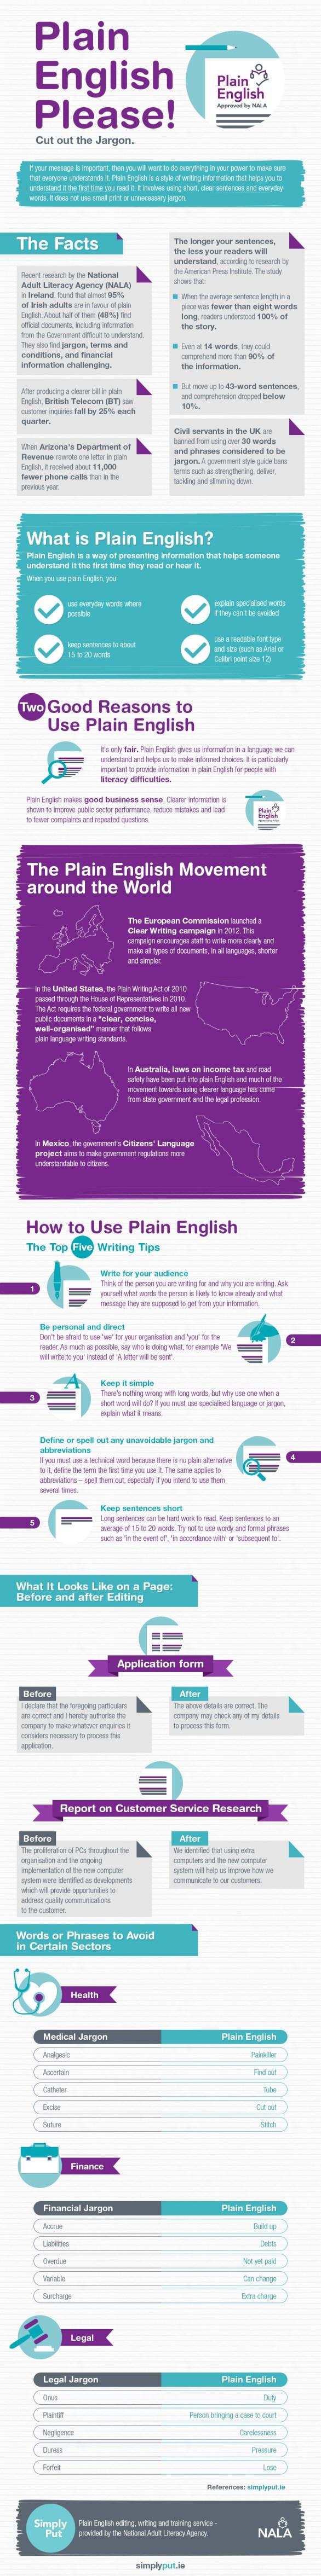 Plain-English-Infographic